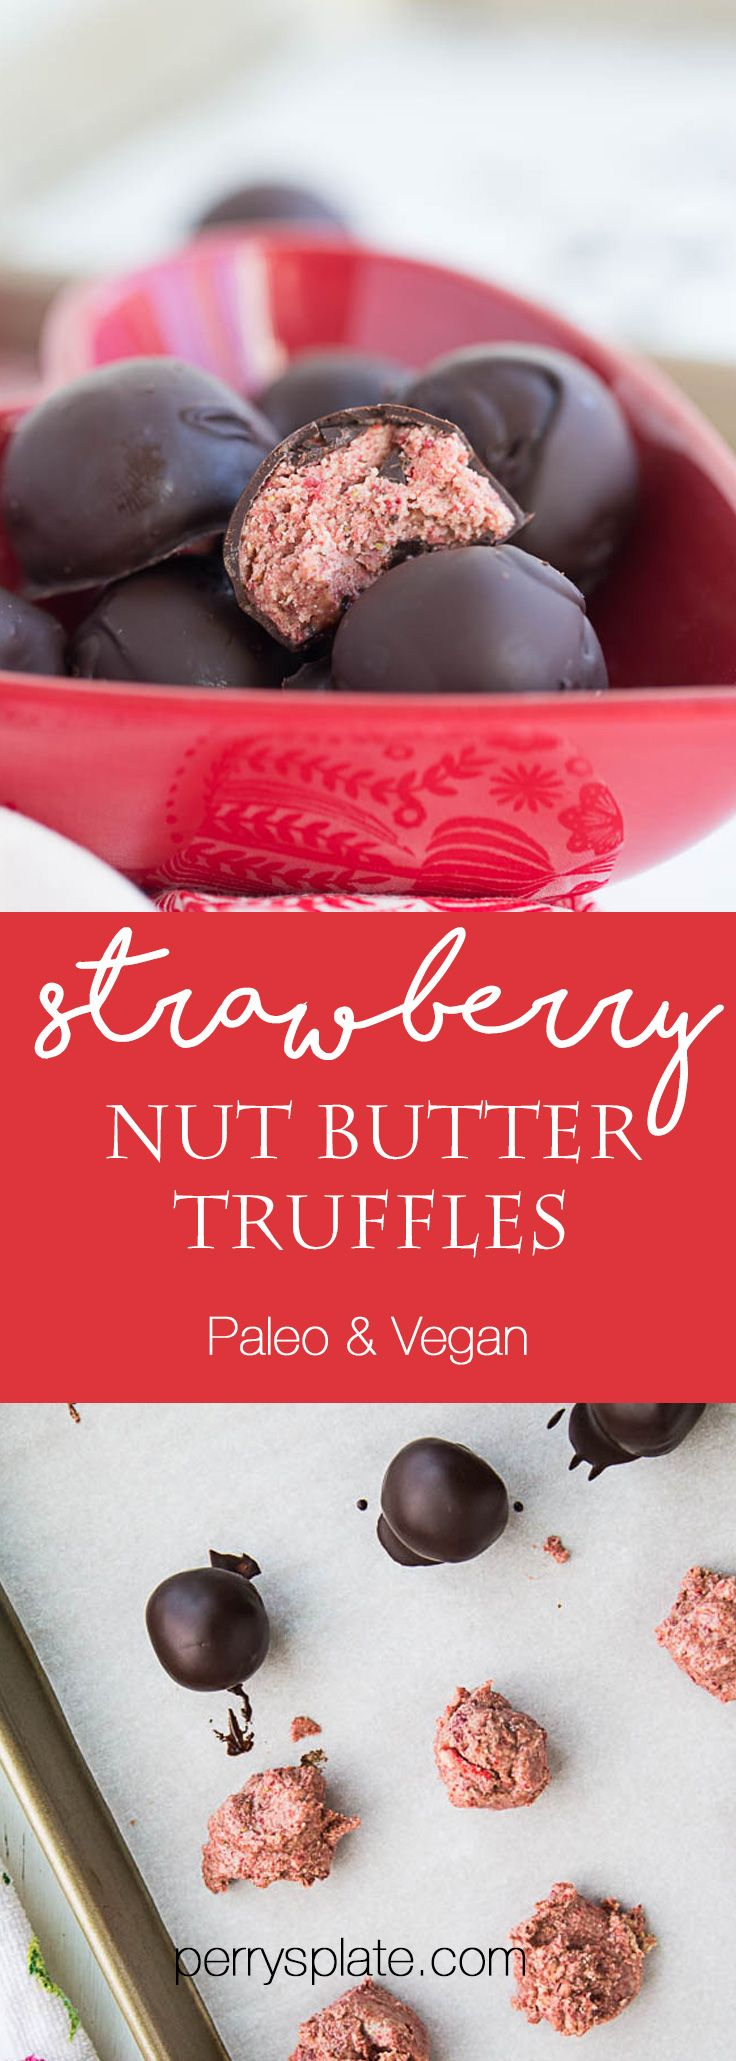 Strawberry Nut Butter Truffles   paleo recipes   paleo dessert   nut butter recipes   Valentine's Day treats   perrysplate.com